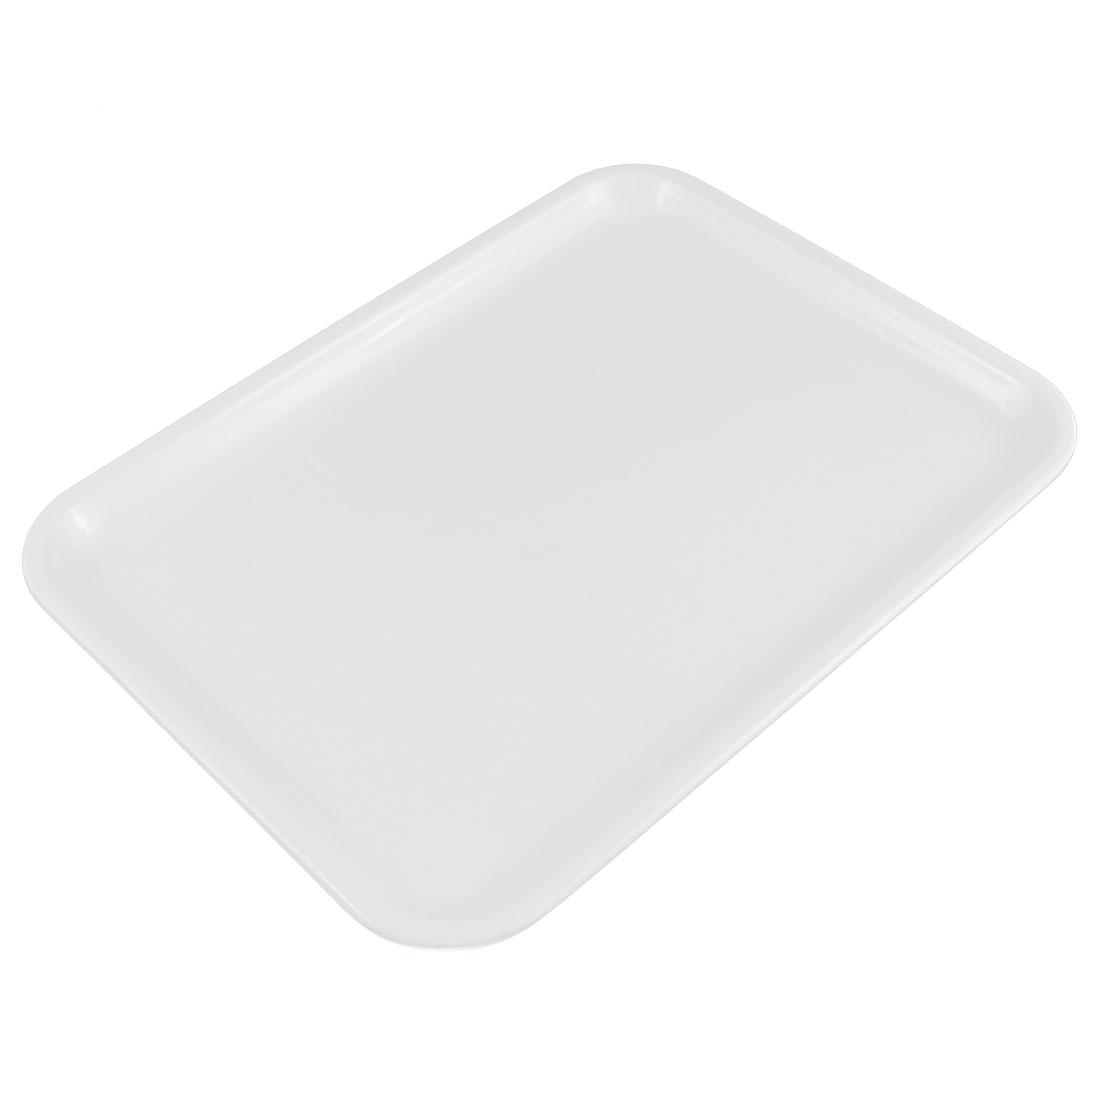 "Hotel Restaurant Plastic Food Cake Drinks Serving Tray White 10"" Length"